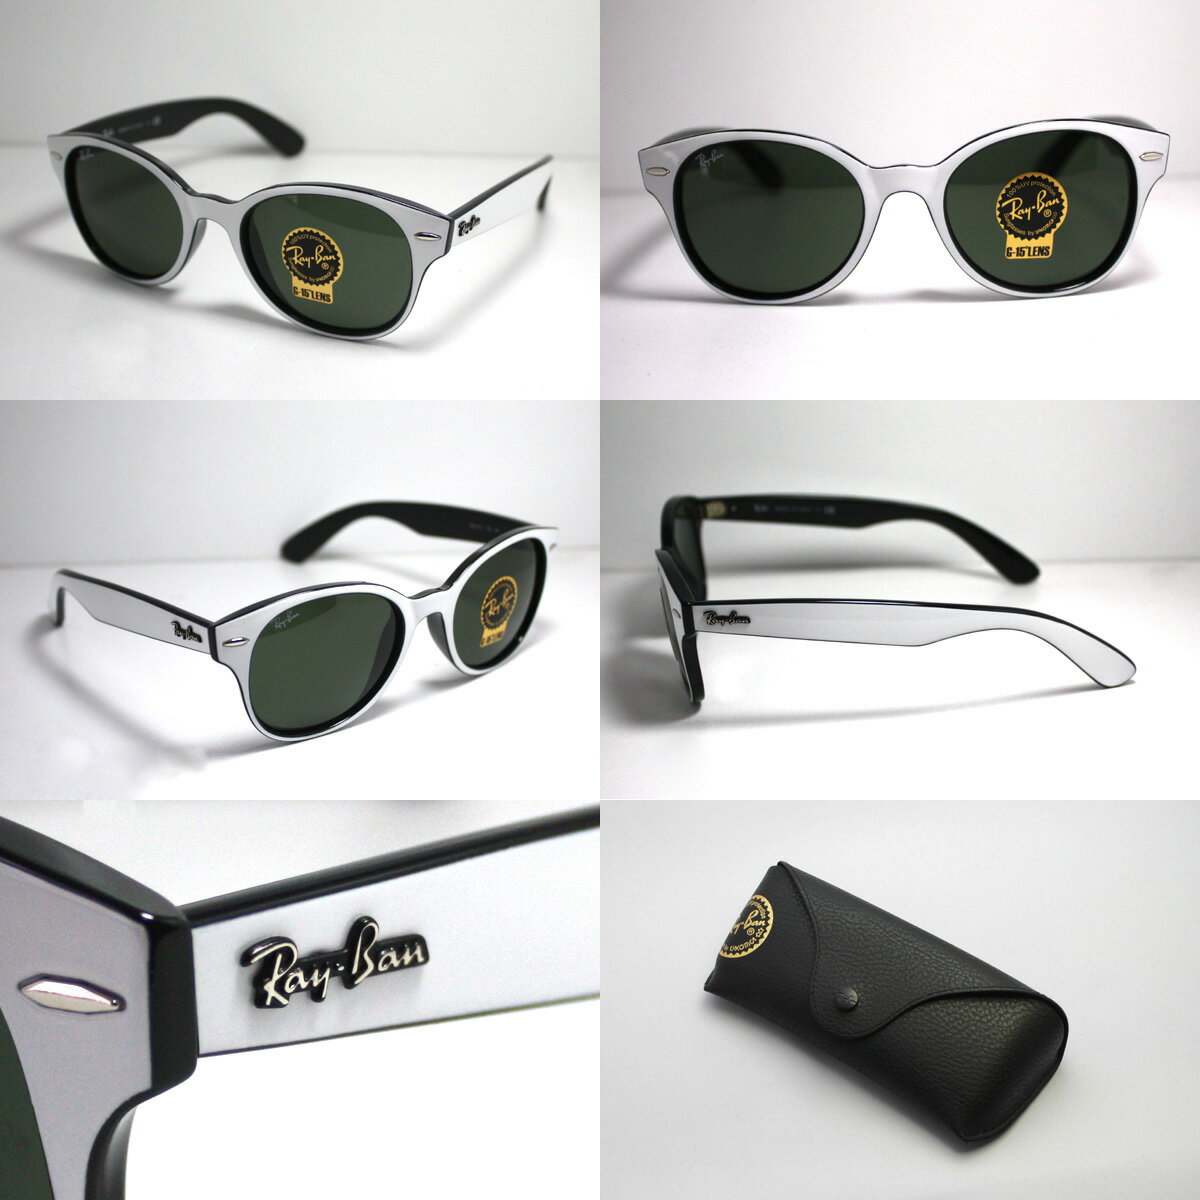 5ee9c7b08a9 Models Wearing Ray Ban Sunglasses « Heritage Malta